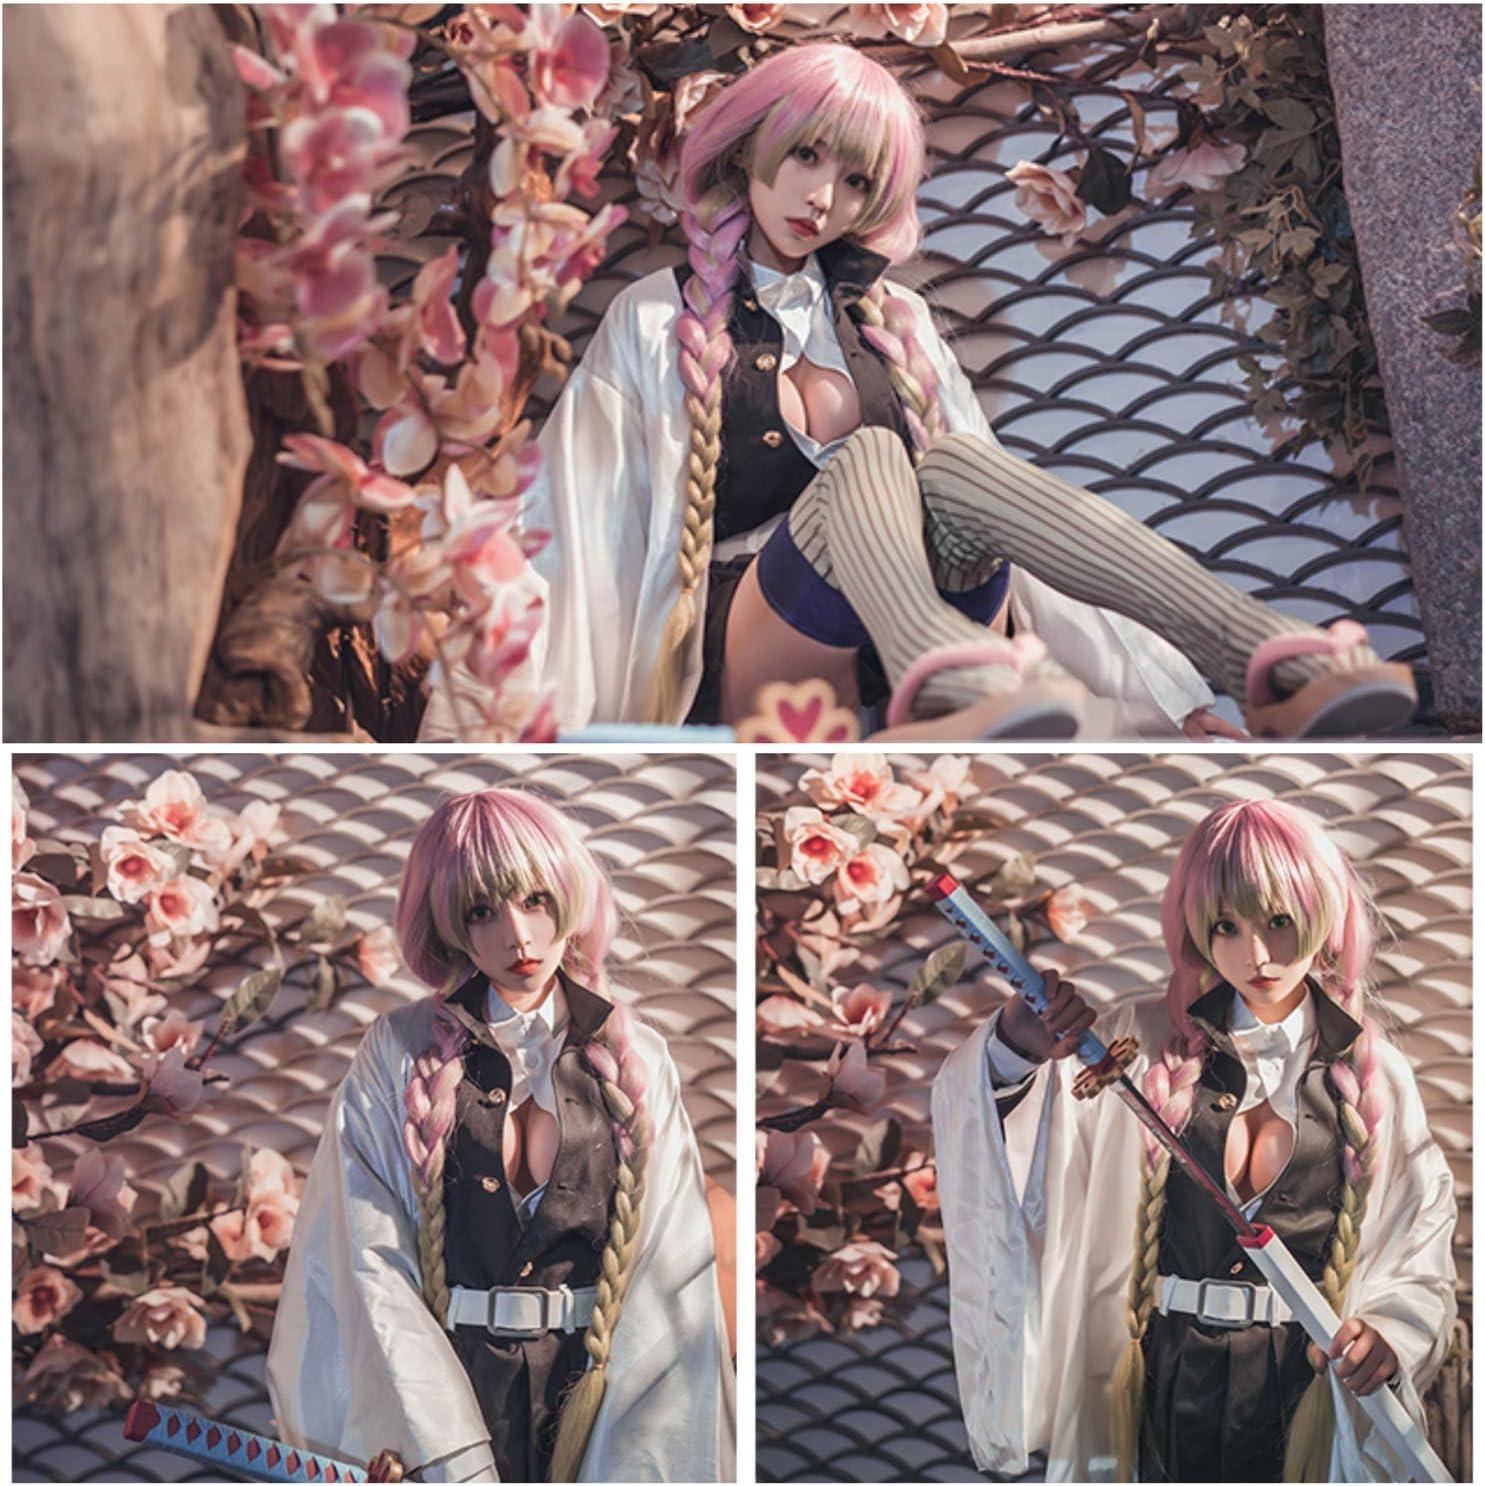 Anime Cosplay peluca para Demon Slayer Kimetsu no Yaiba Kamado Nezuko negro degradado marr/ón largo rizado pelo Cap juego de rol Pelucas de Halloween